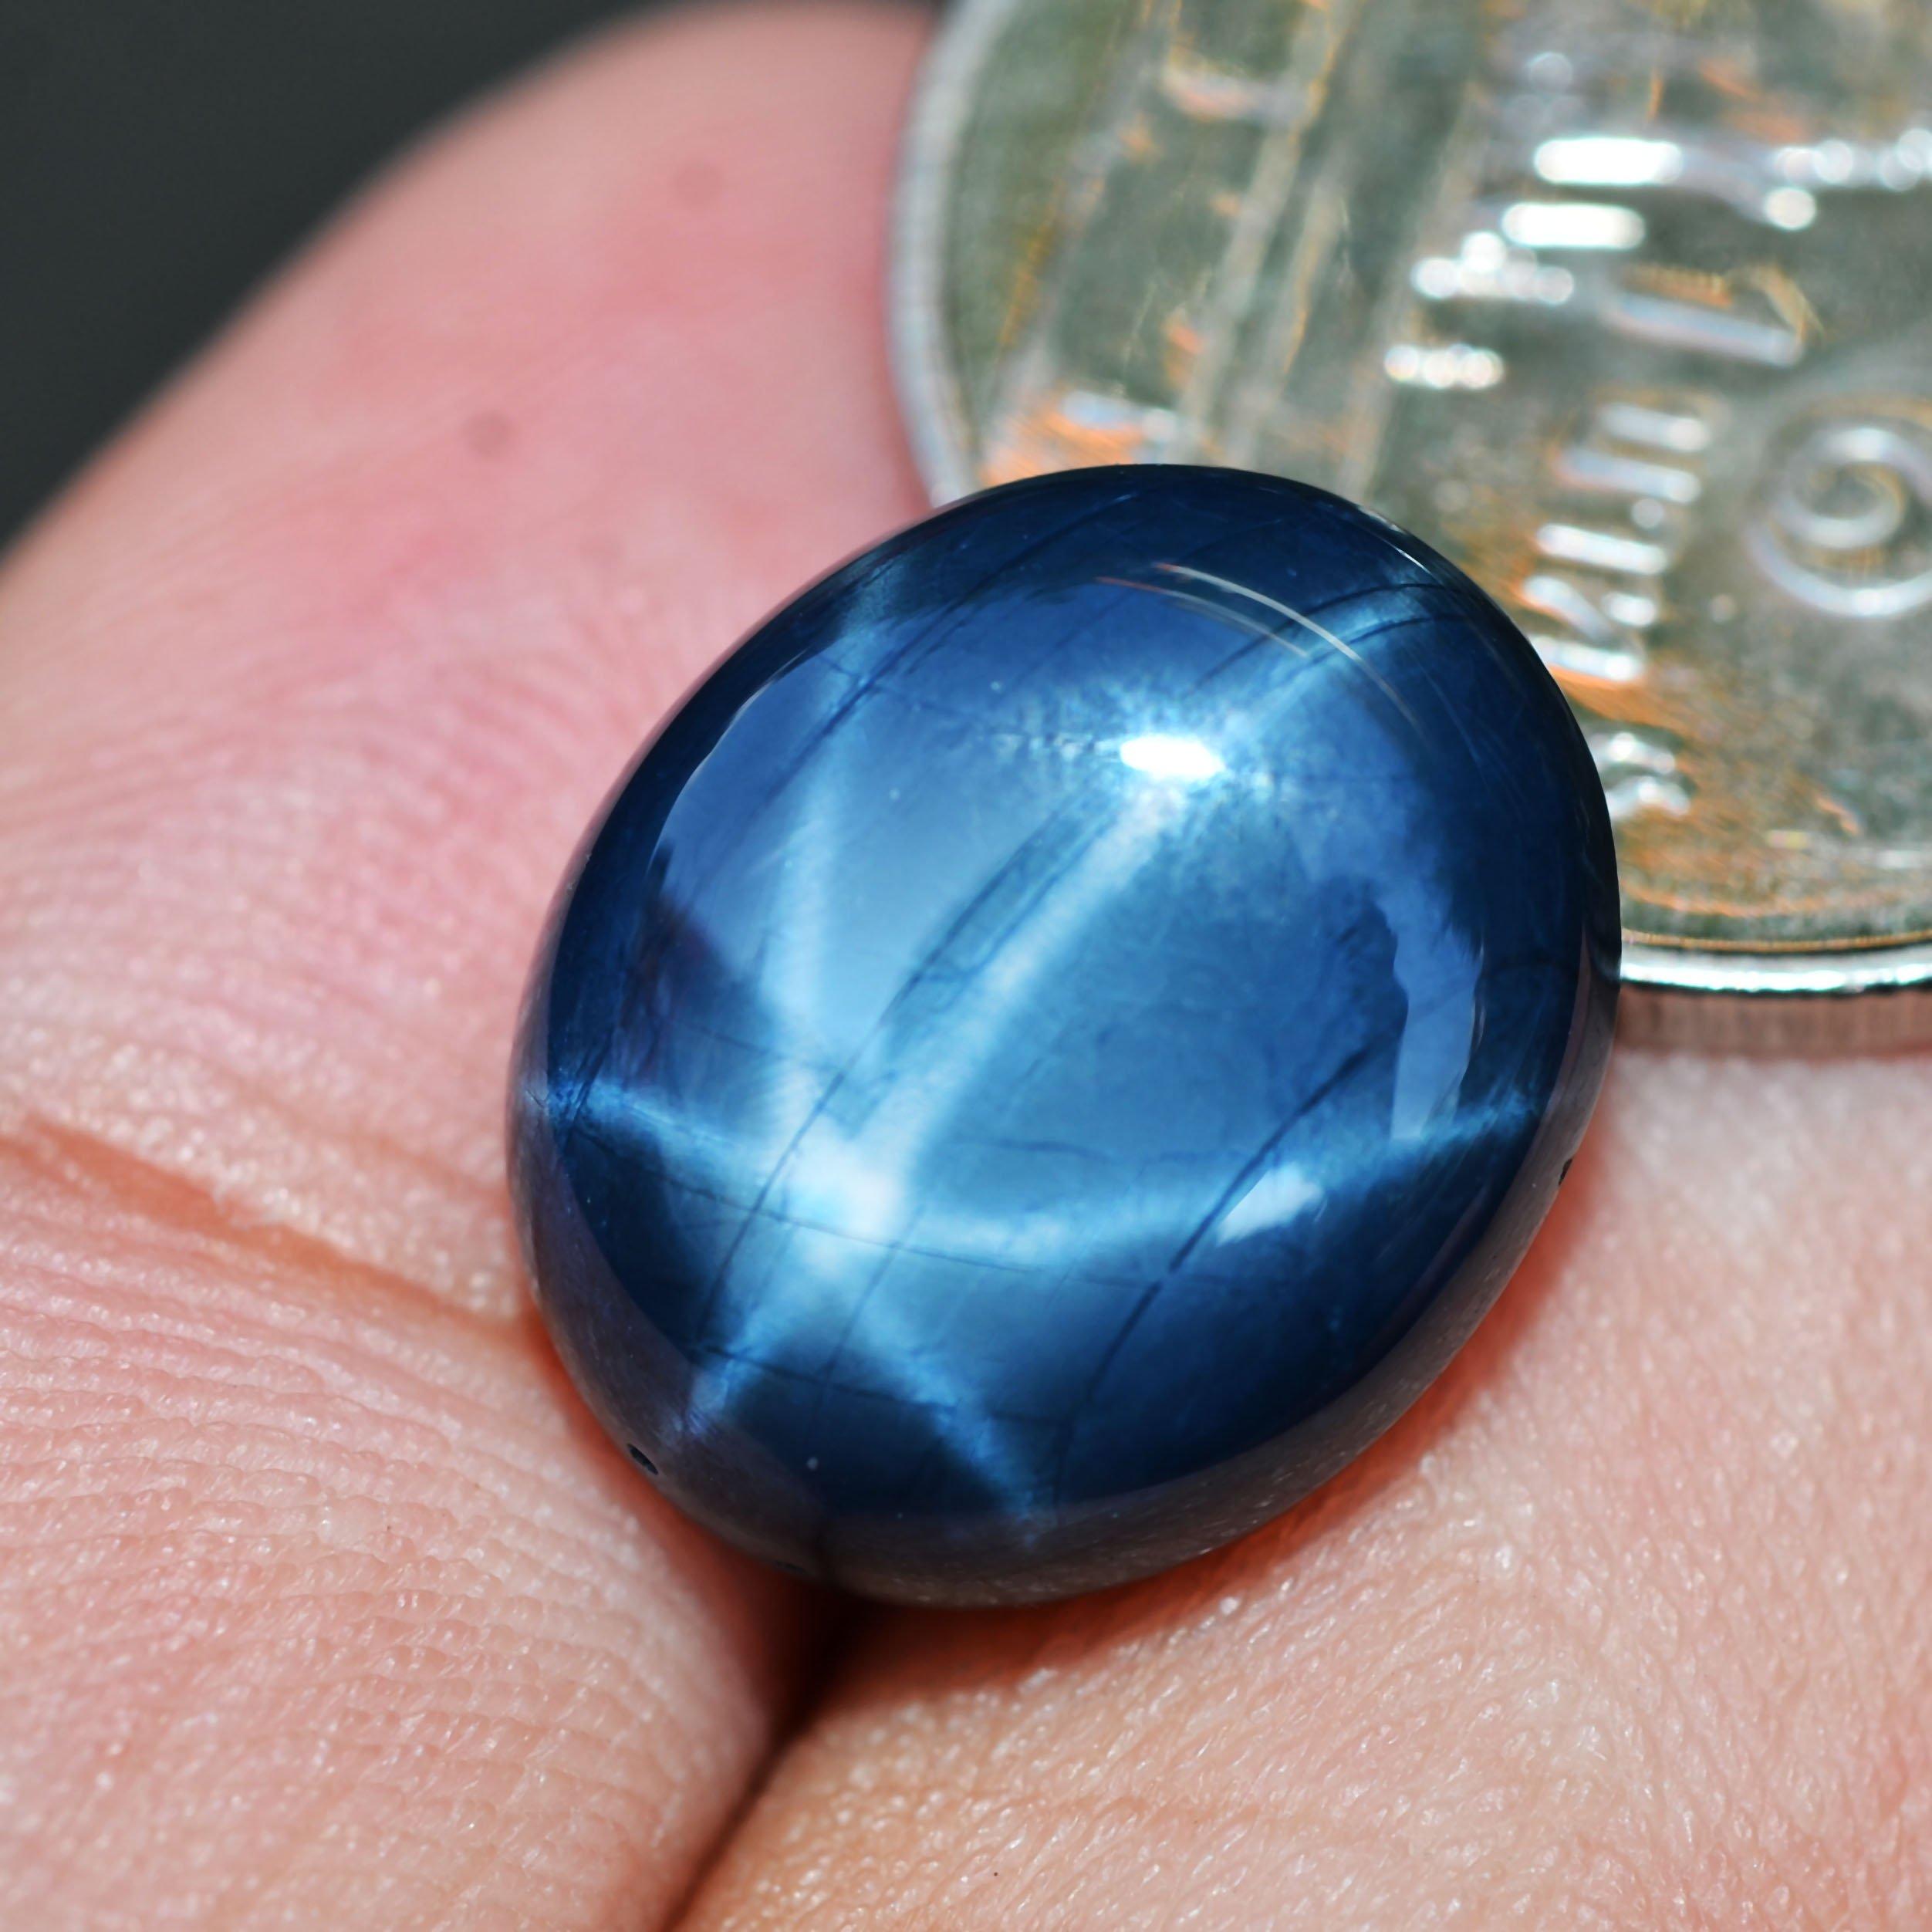 10.57ct Natural Cabochon Blue Stars Sapphire 6 Ray Thailand #B by Lovemom (Image #2)